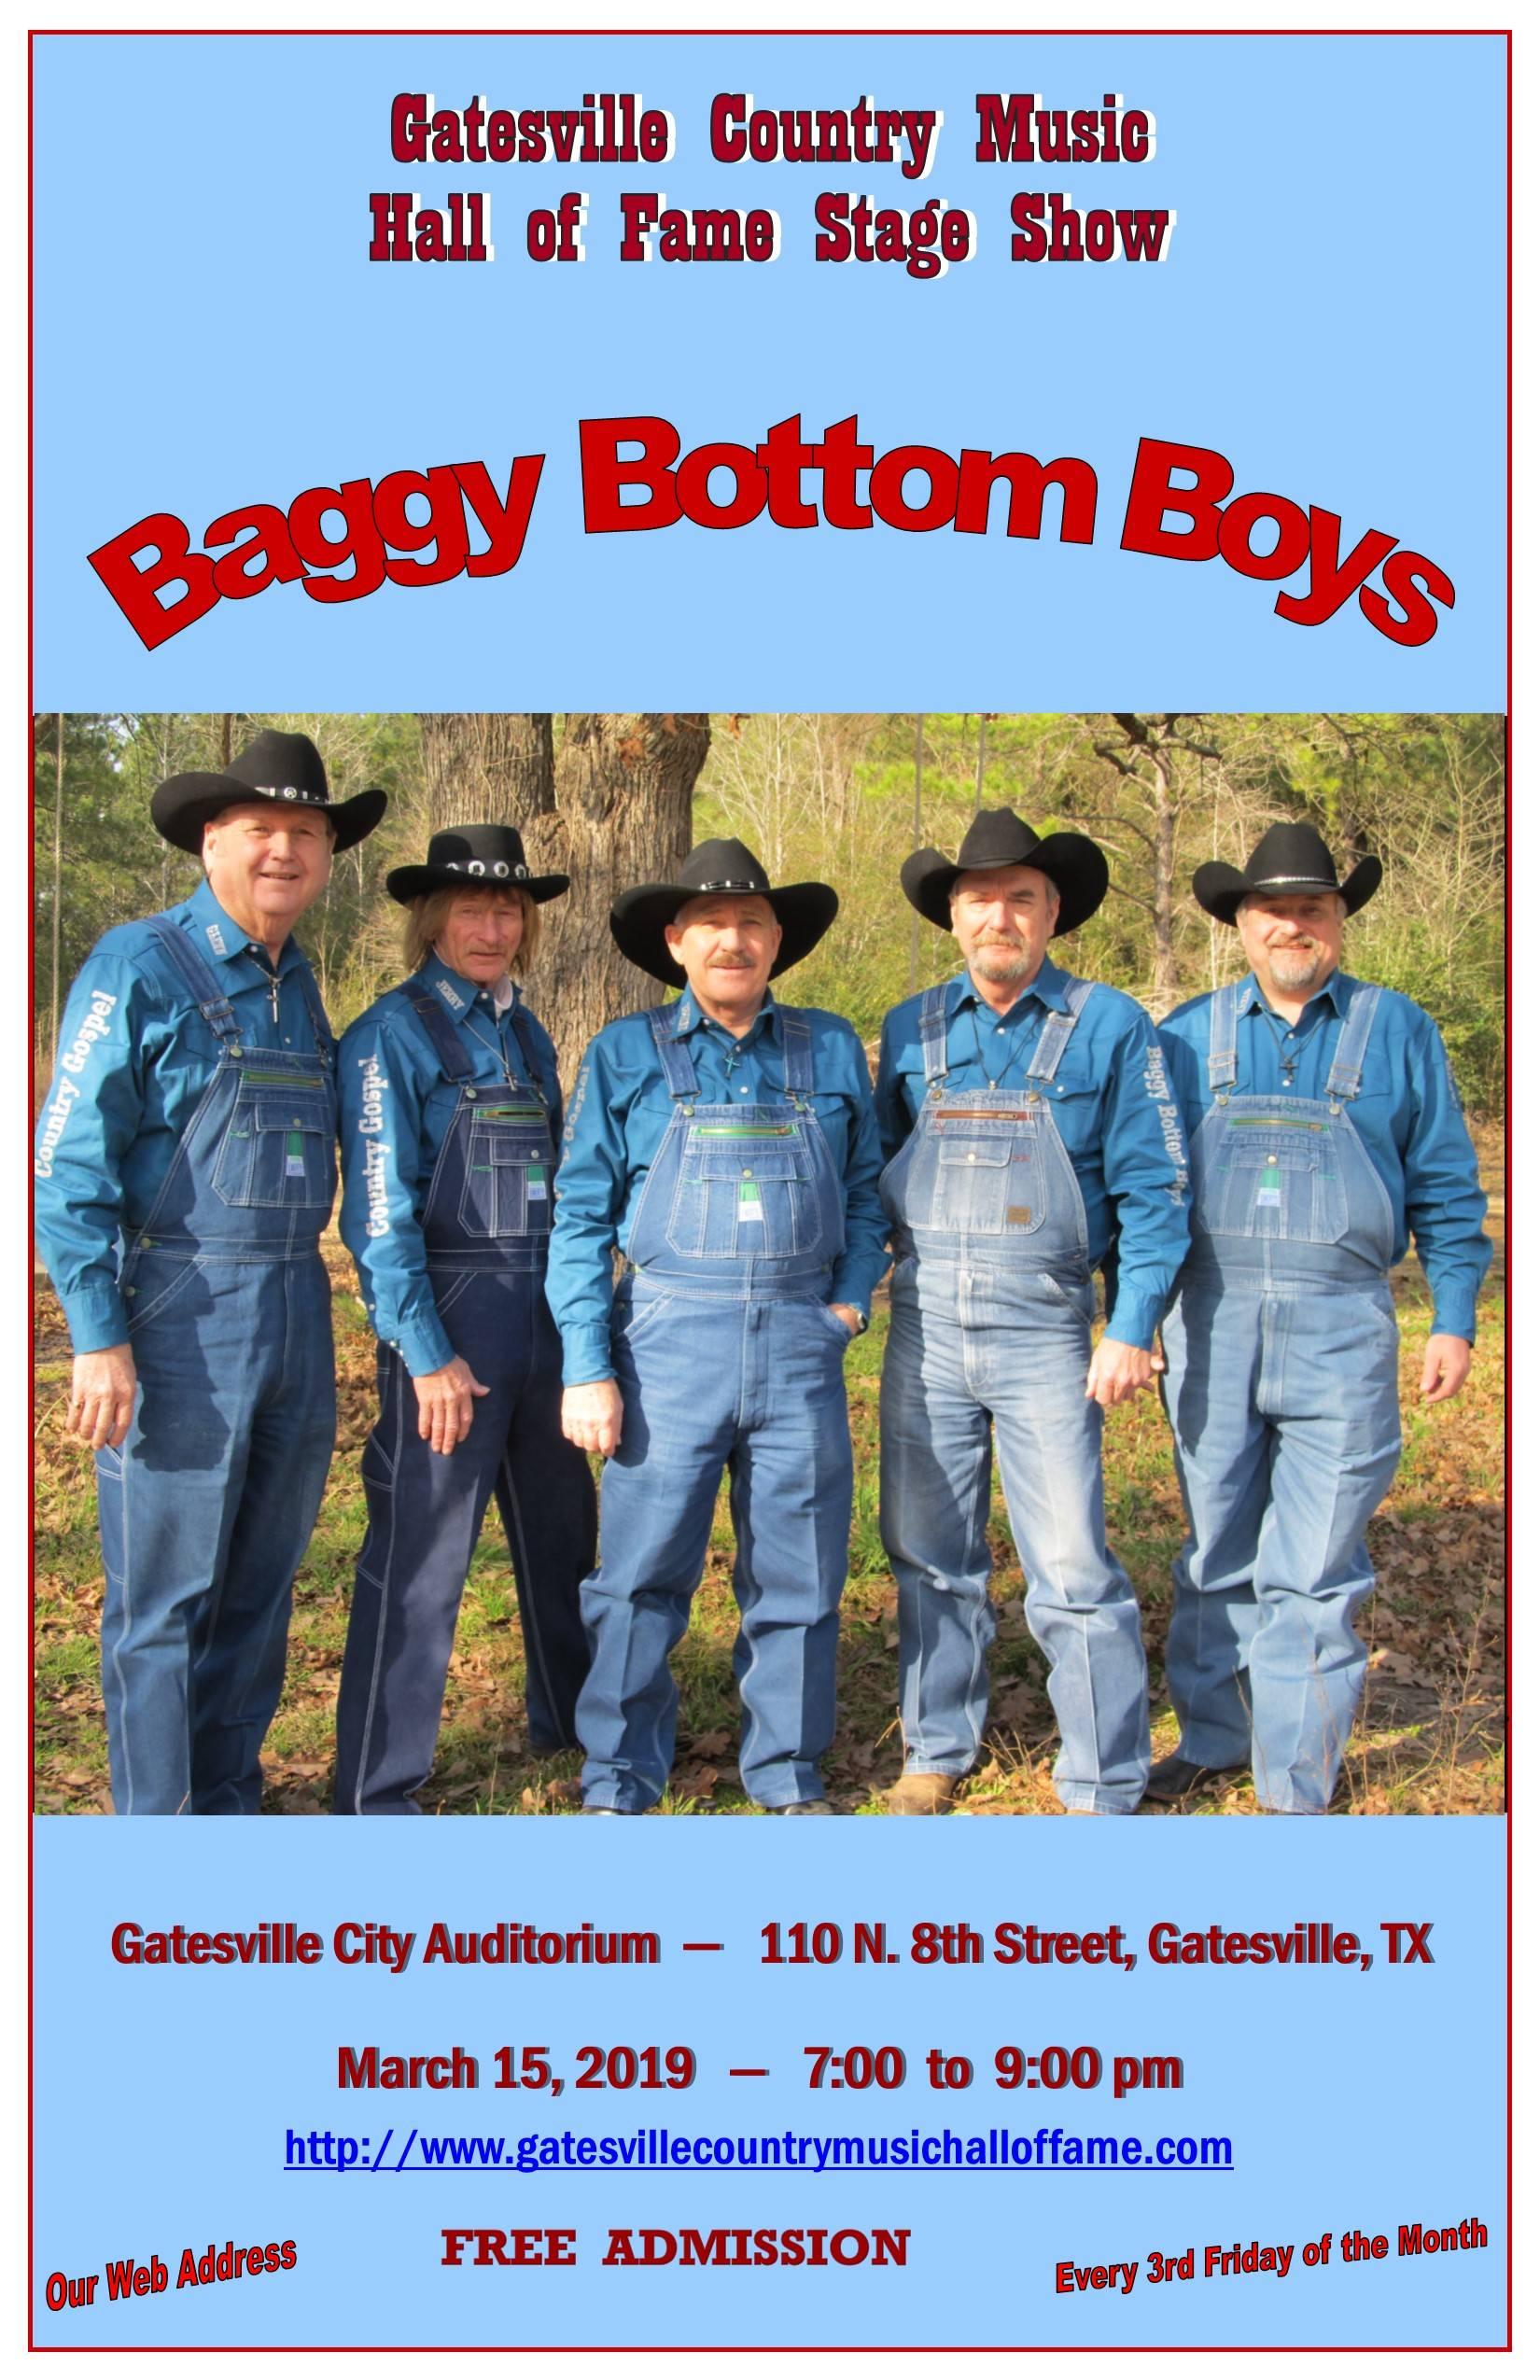 Baggy Bottom Boys, March 15, 2019